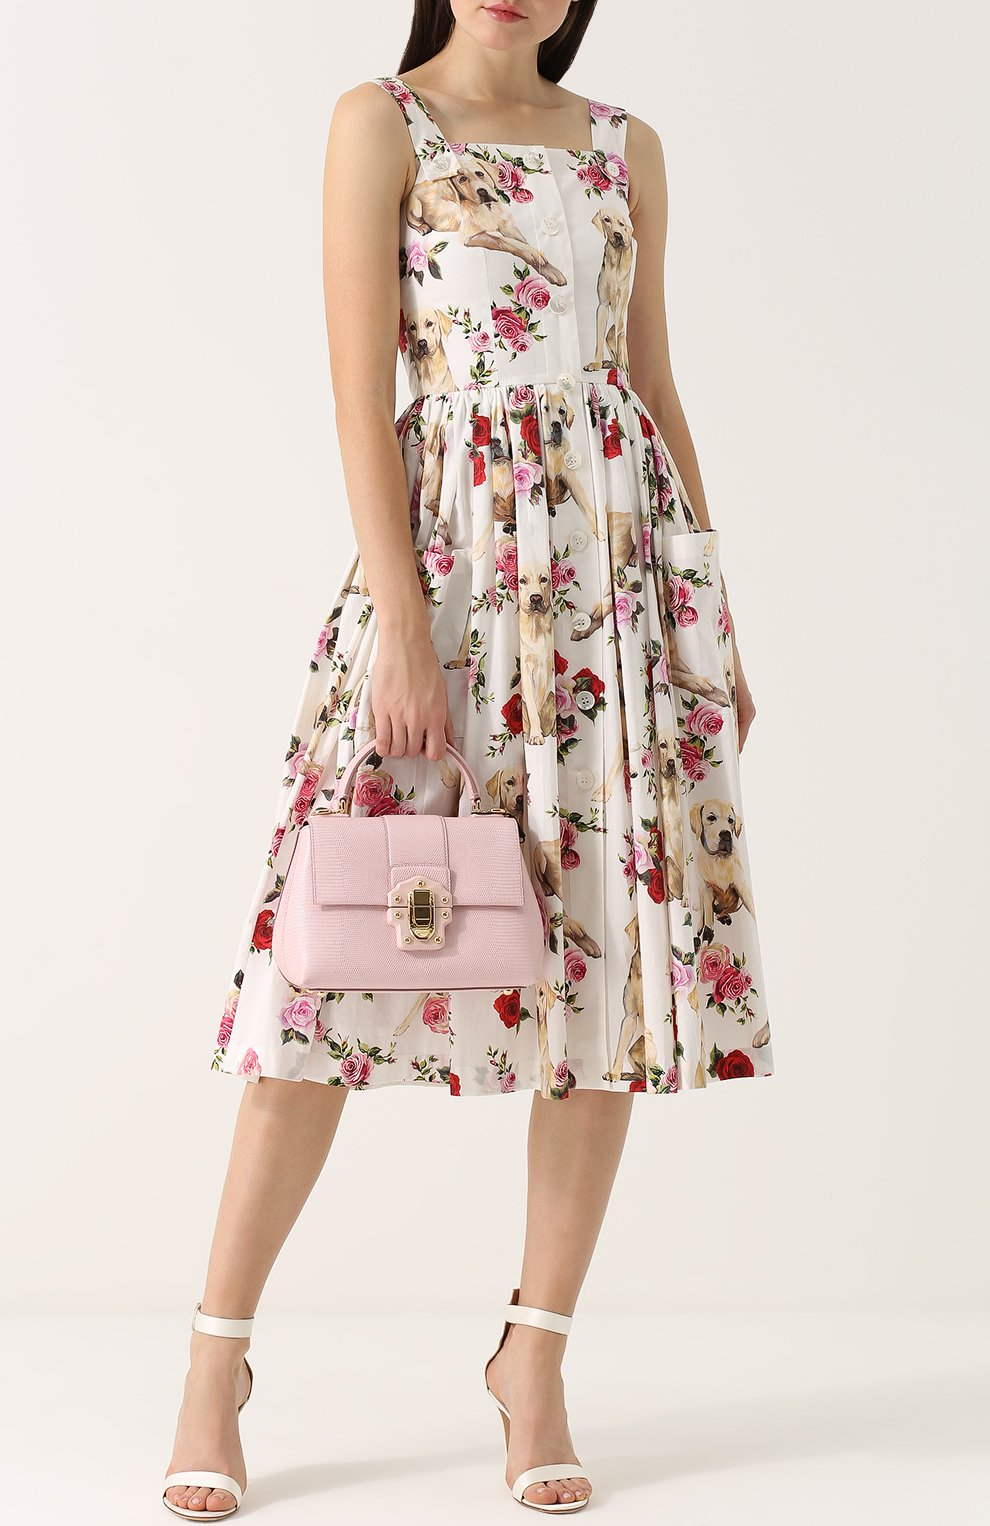 Сумка Lucia из тисненой кожи Dolce & Gabbana светло-розовая цвета | Фото №2